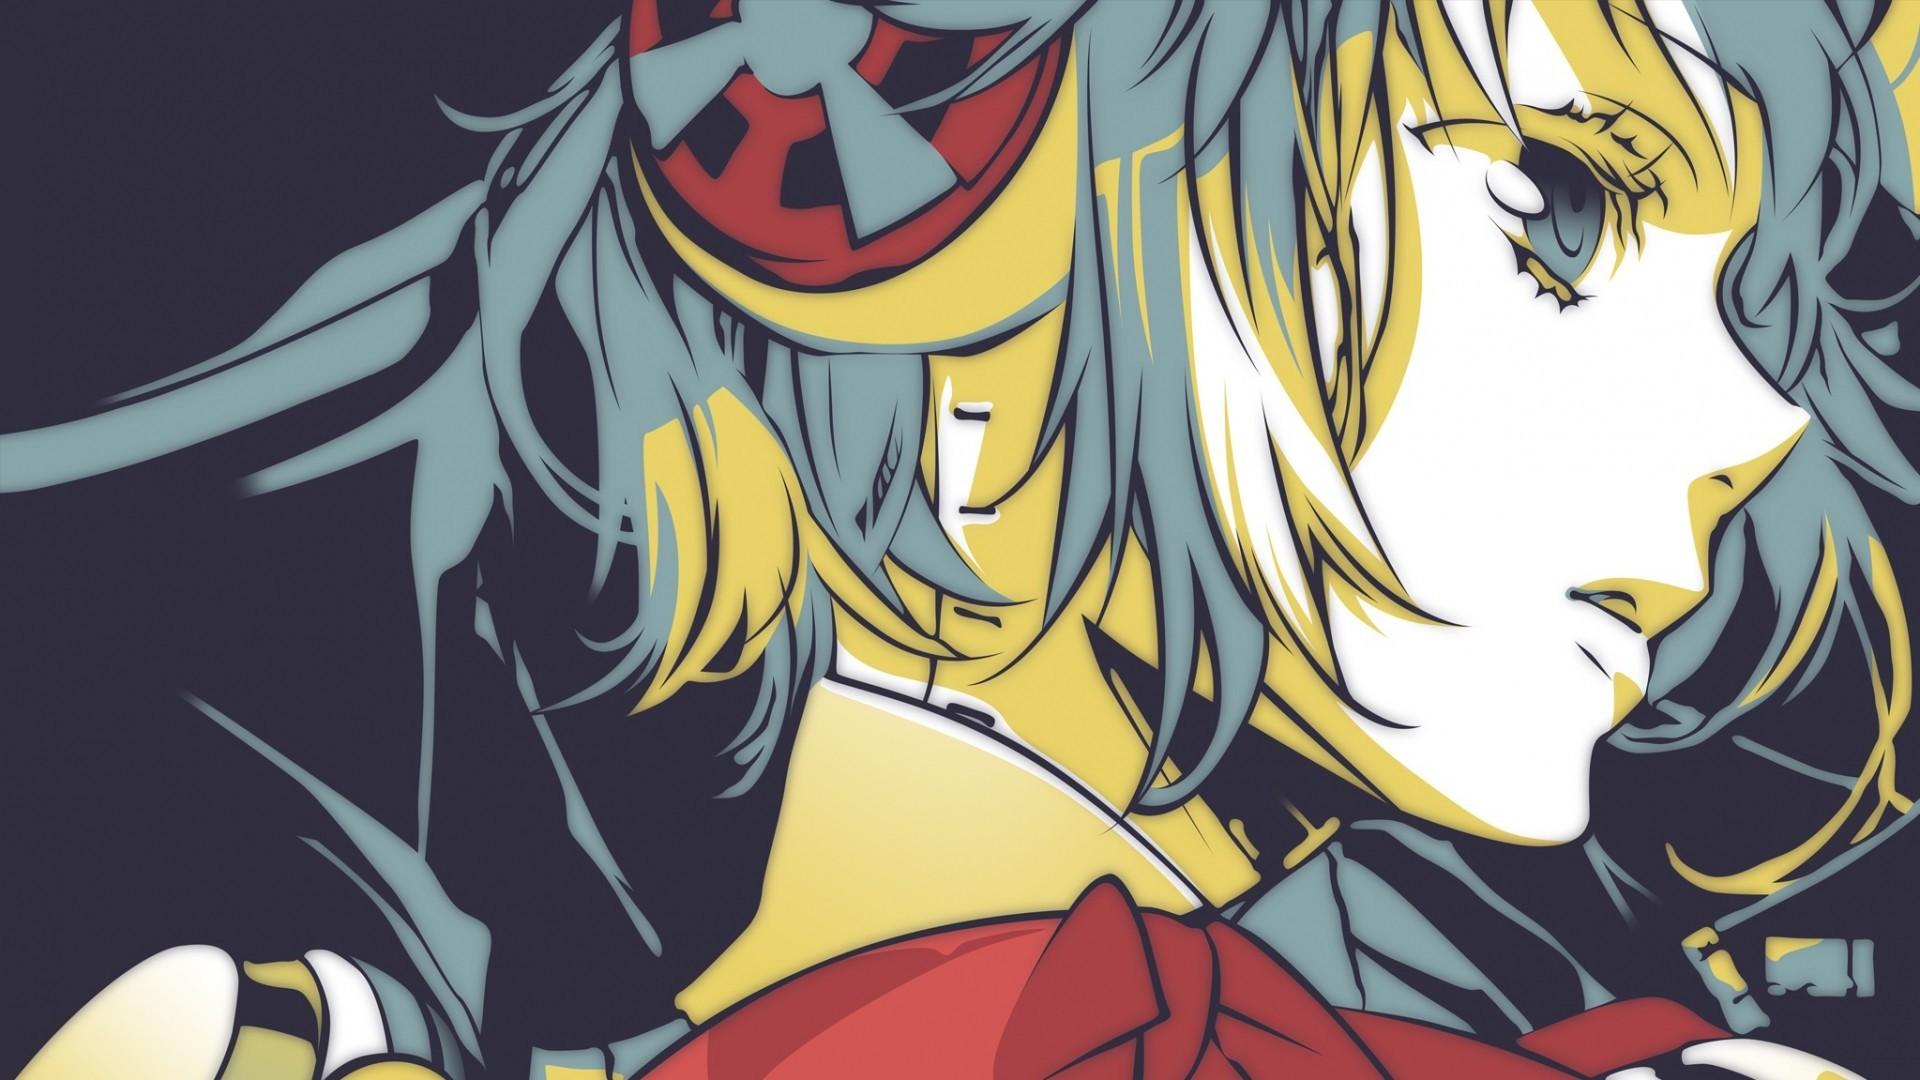 Anime Girl With Headphones Wallpaper Hd Wallpaper Manga Hd 1920x1080 Sur Le Forum Blabla 18 25